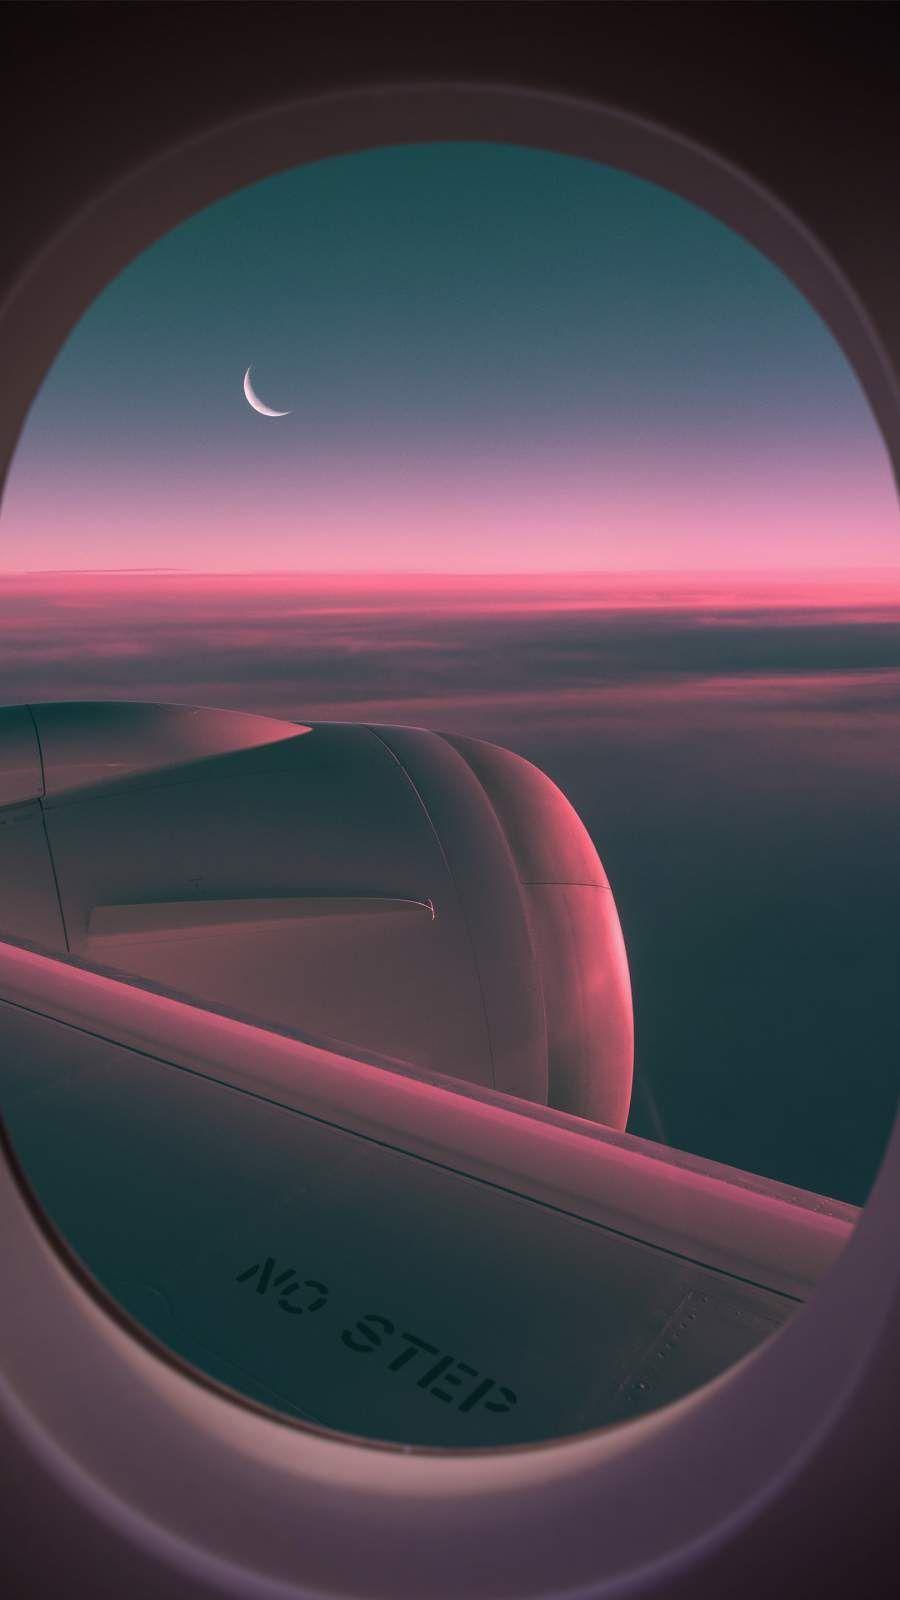 airplane window wallpaper iphone